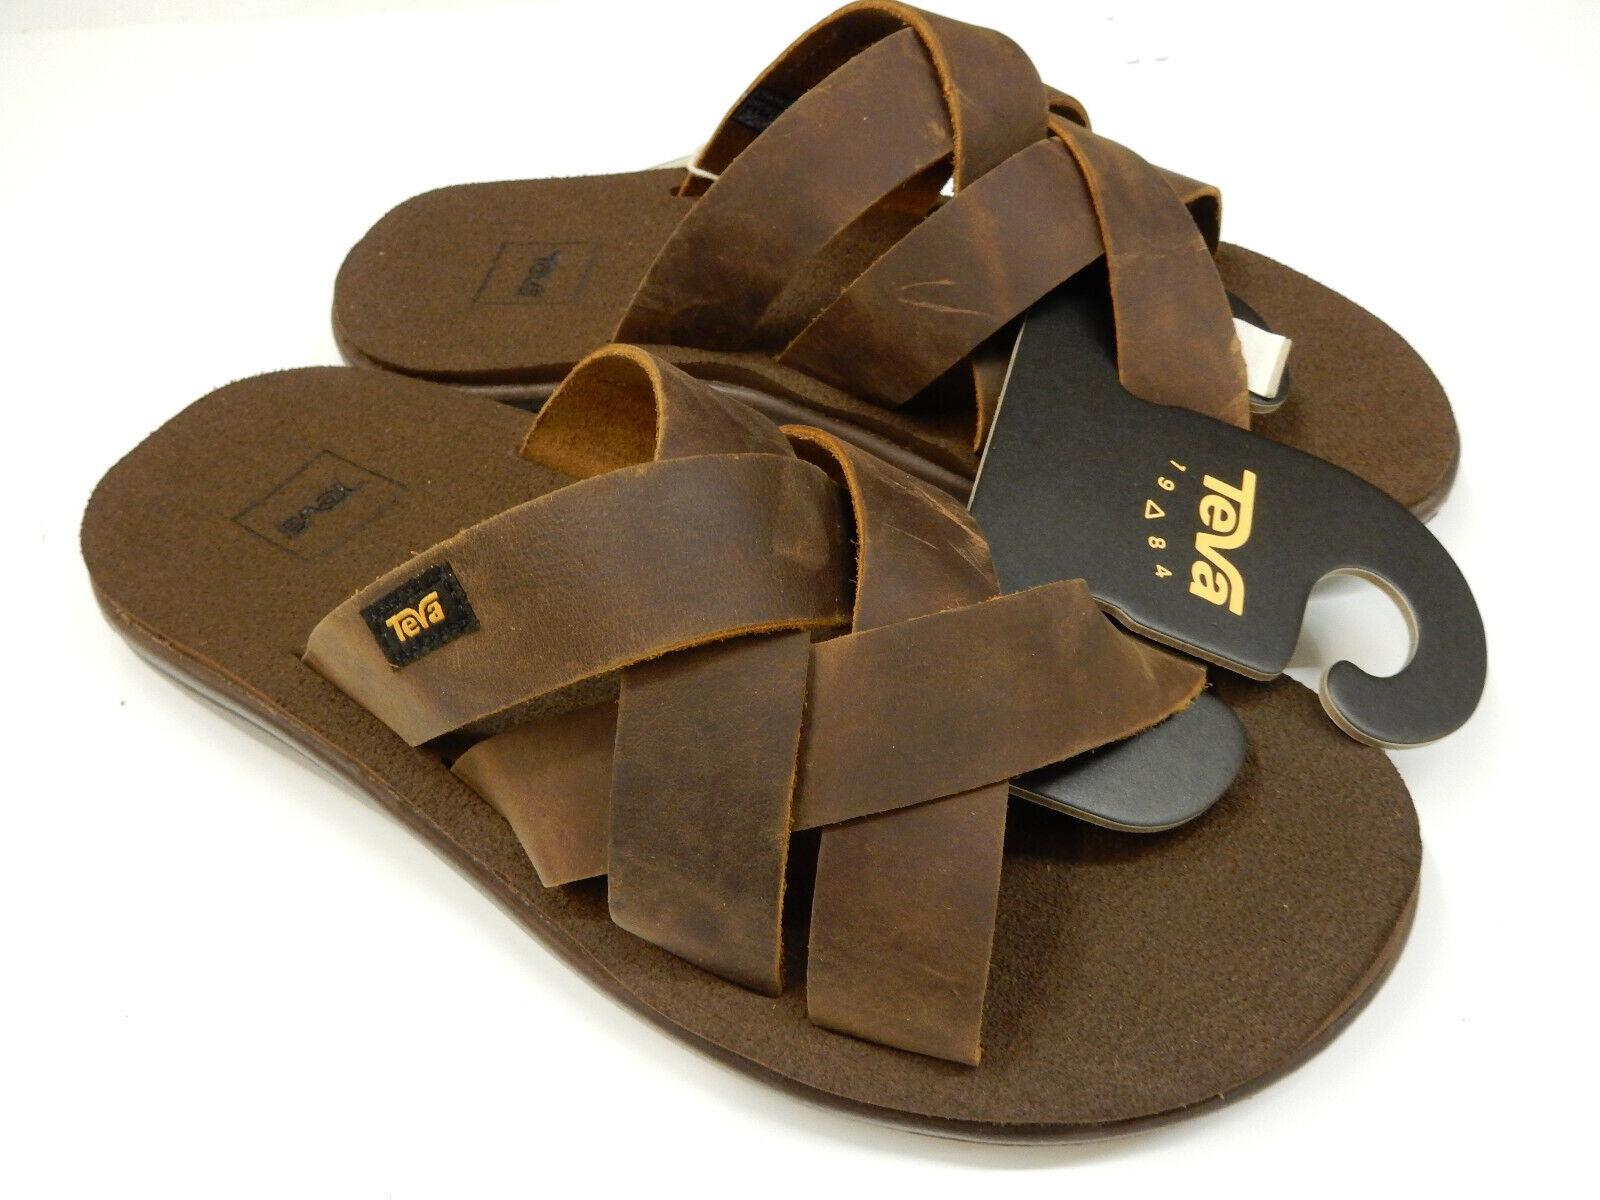 Teva Mens Voya Slide Leather Pecan Size 8